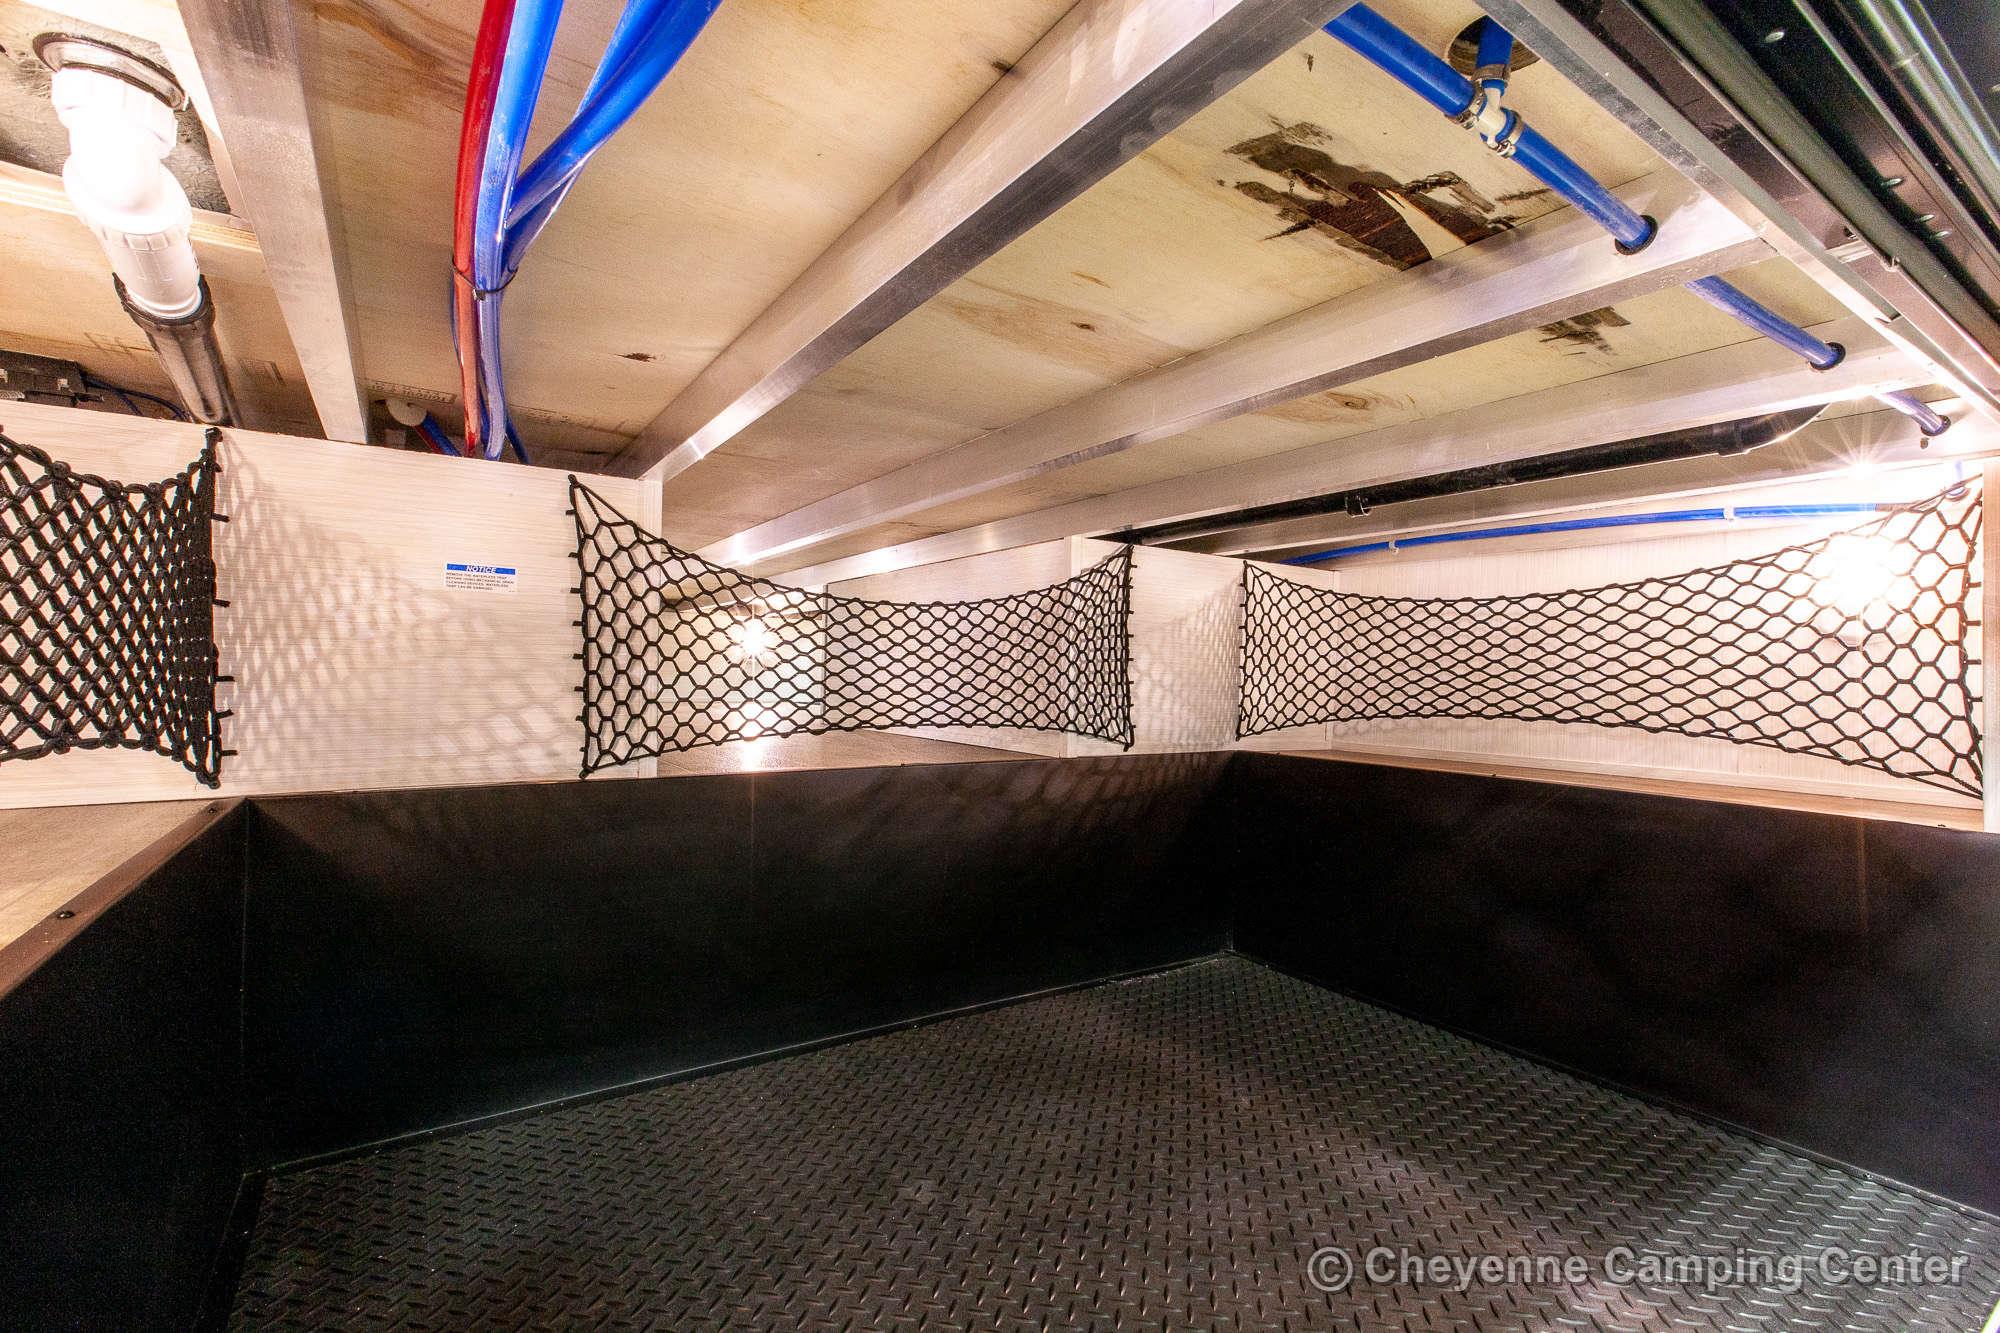 2022 Forest River Cedar Creek 371FL Fifth Wheel Exterior Image